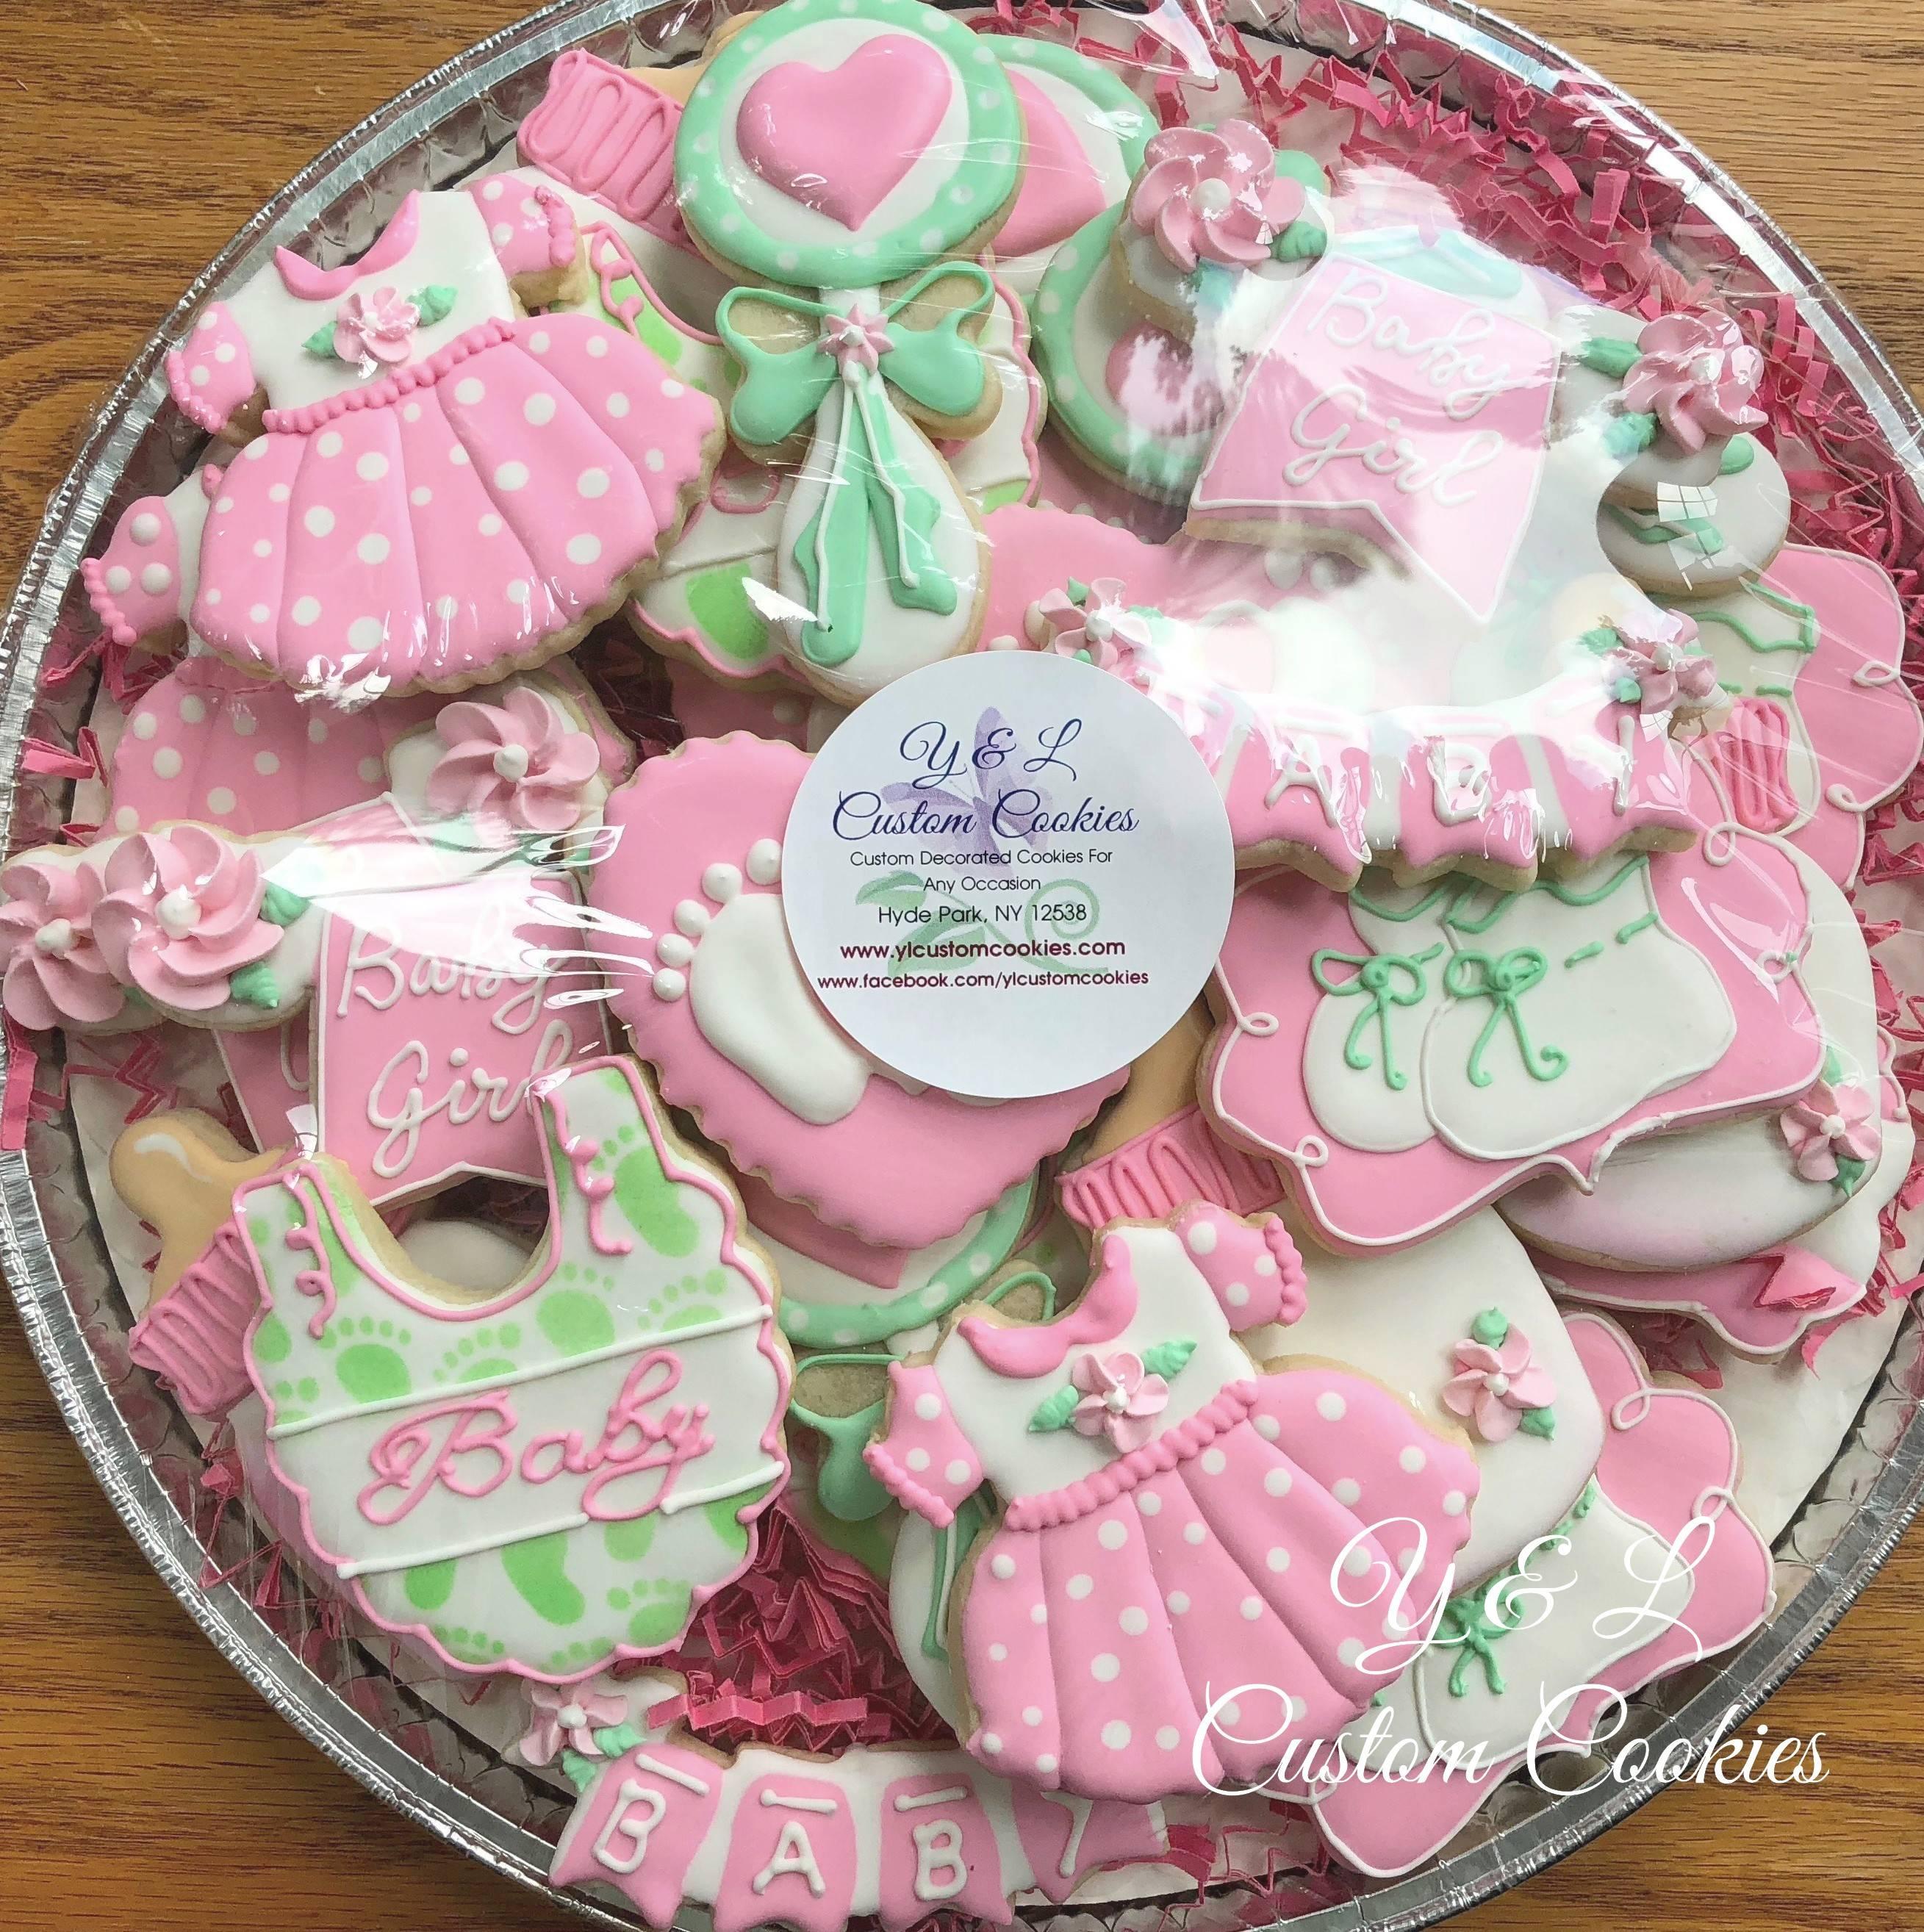 Girl Baby Shower Custom Cookies Platter